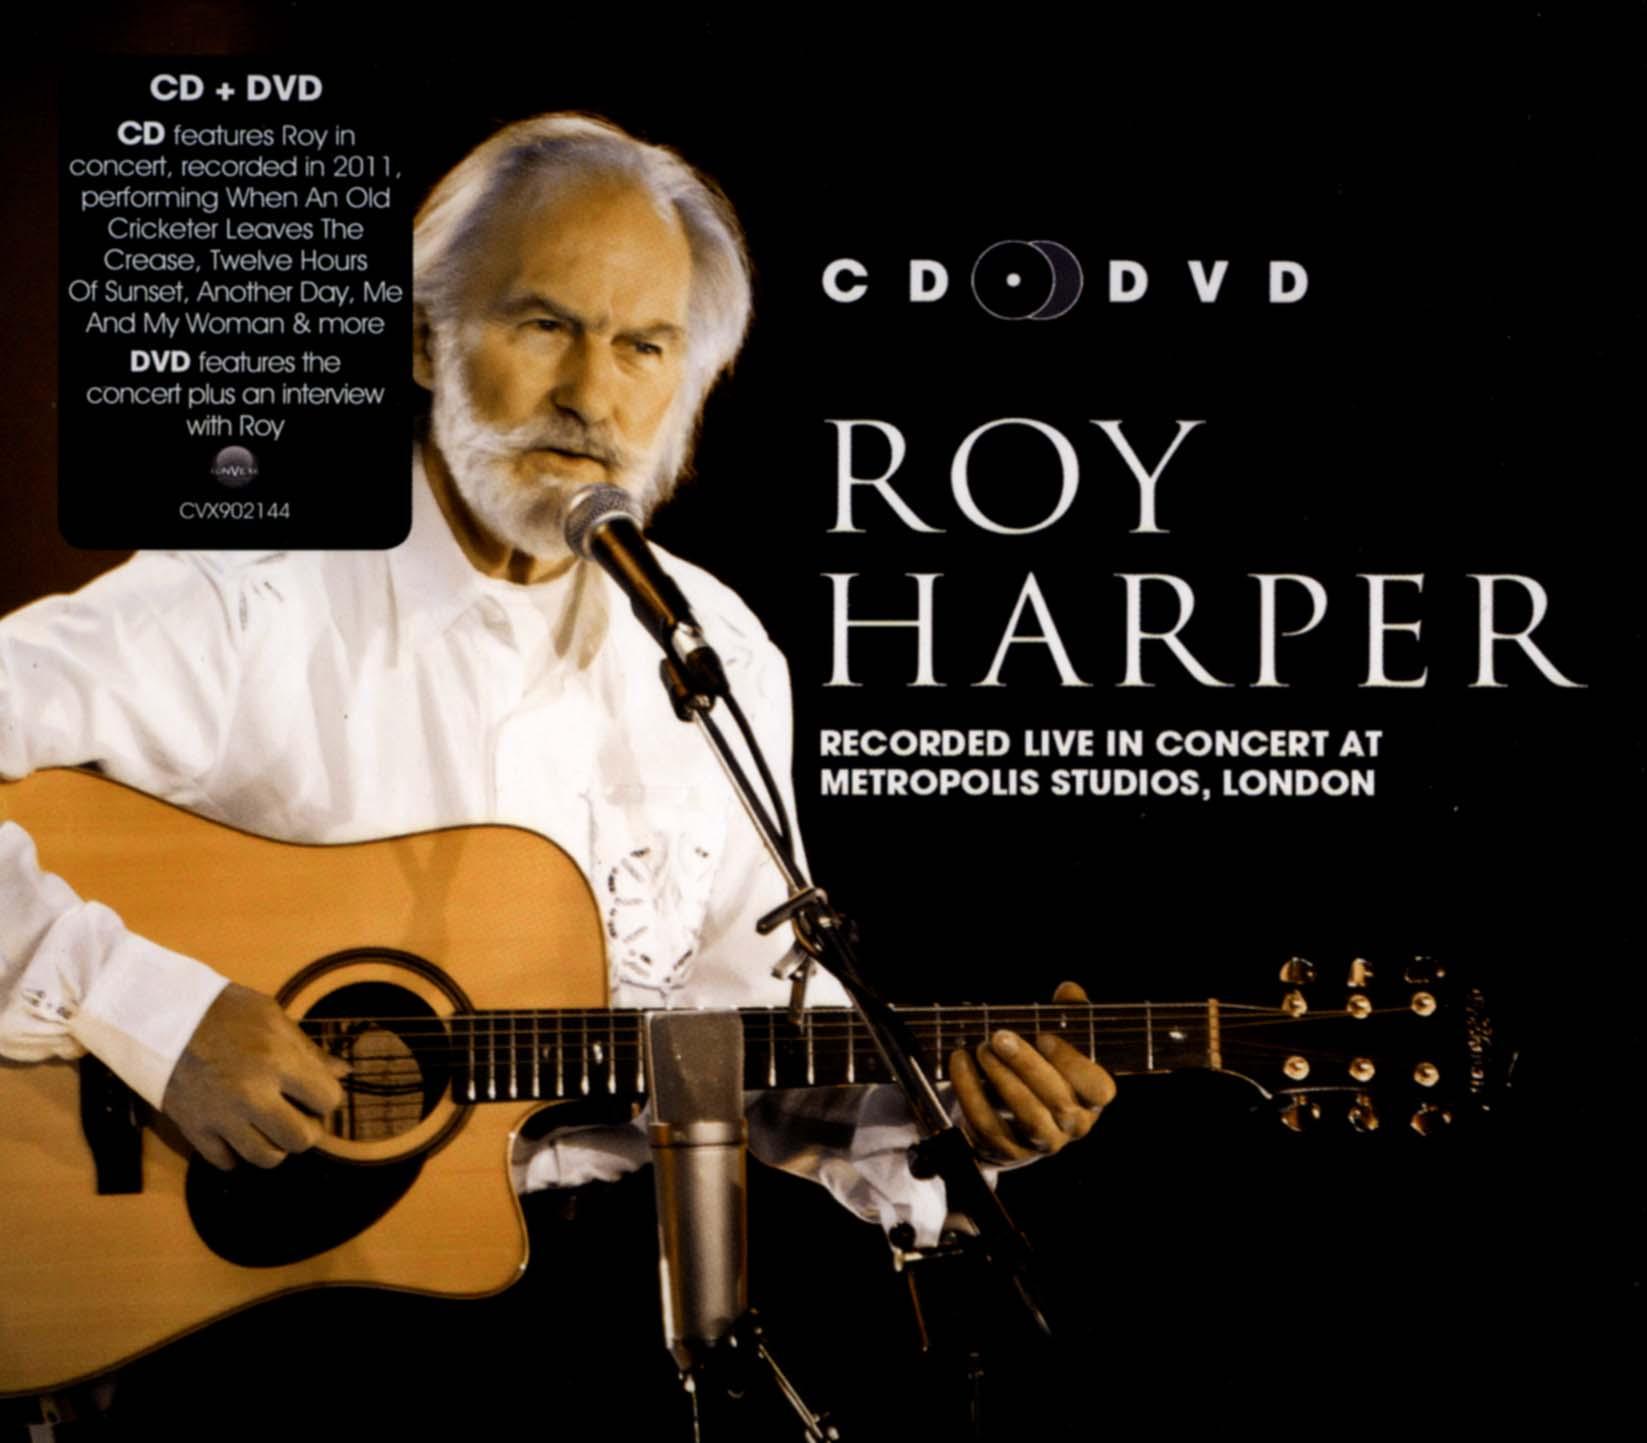 Roy Harper: Recorded Live in Concert at Metropolis Studios, London